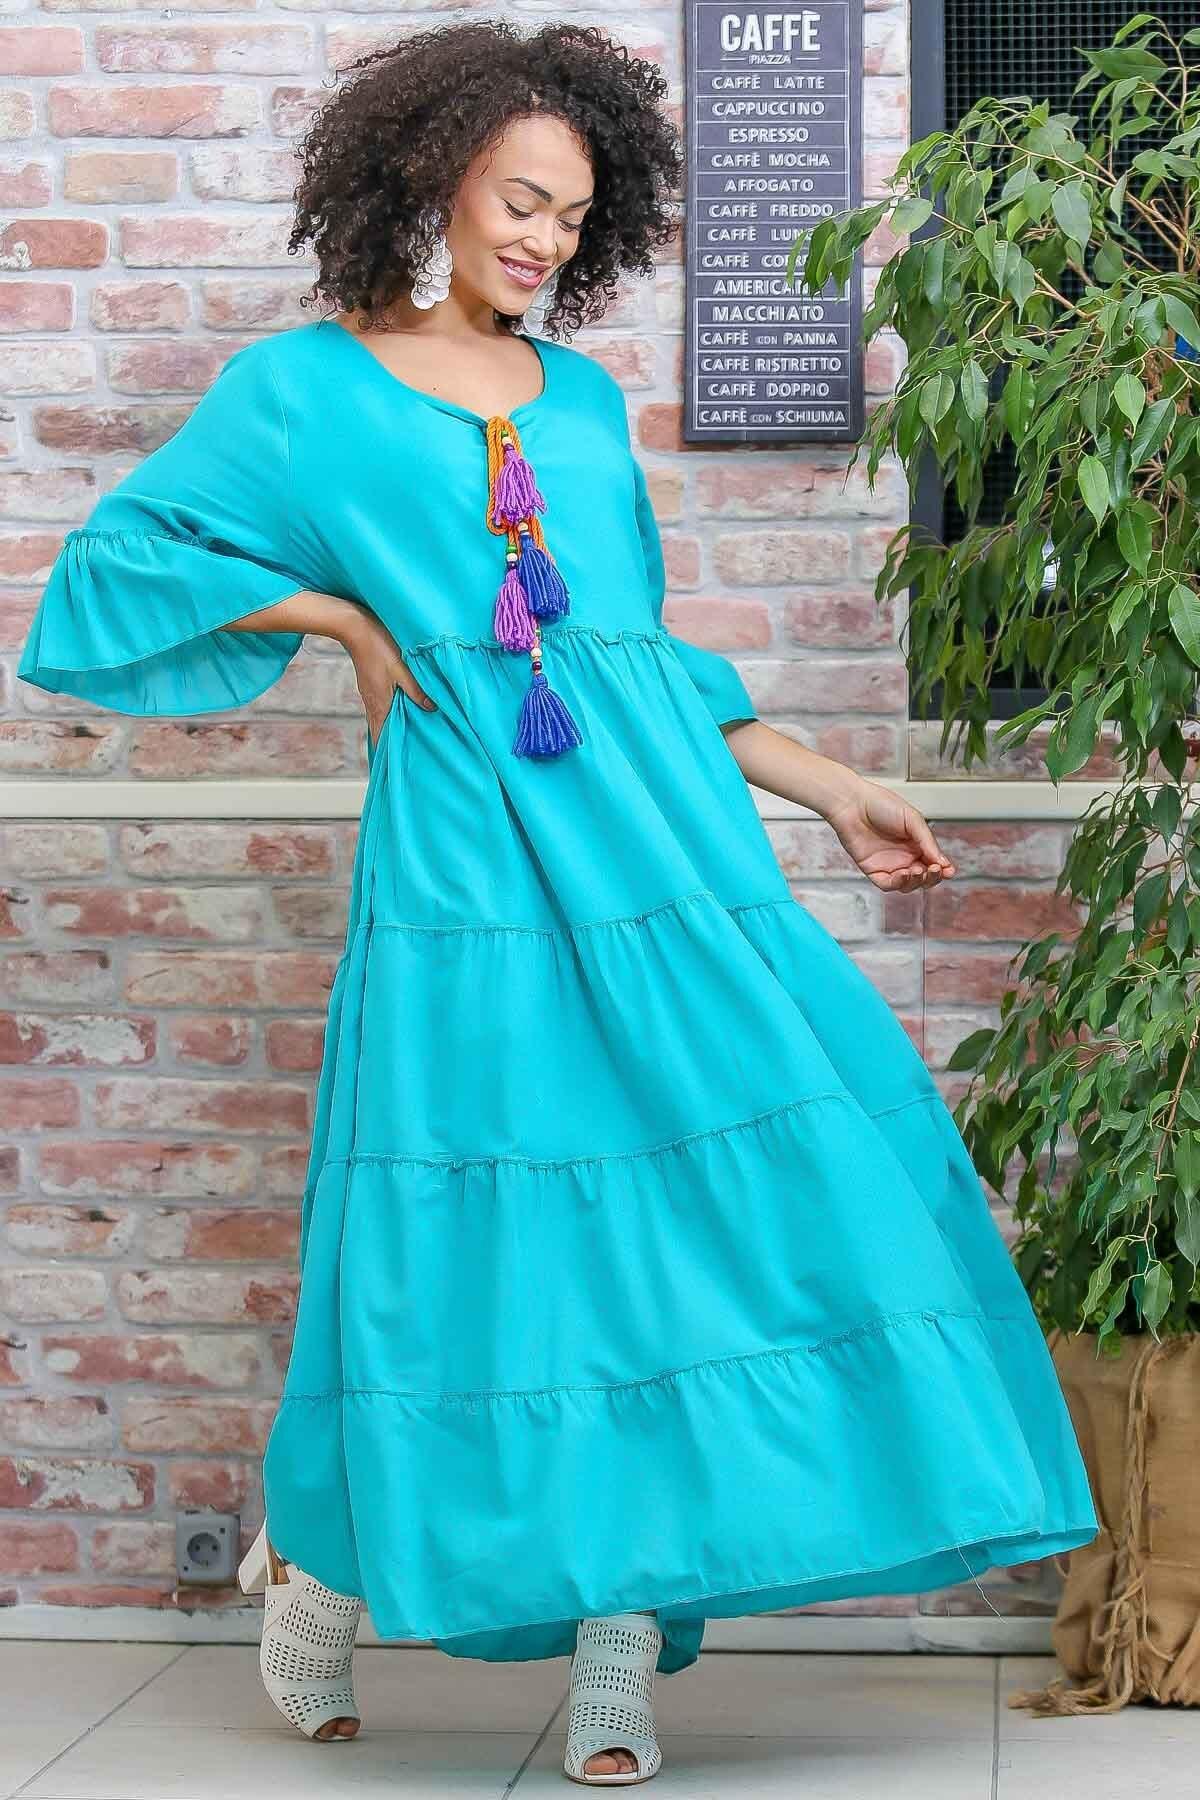 Chiccy Kadın Turkuaz Vintage Oversize El Yapımı Mix Renkli Püskül Detaylı Elbise M10160000EL97016